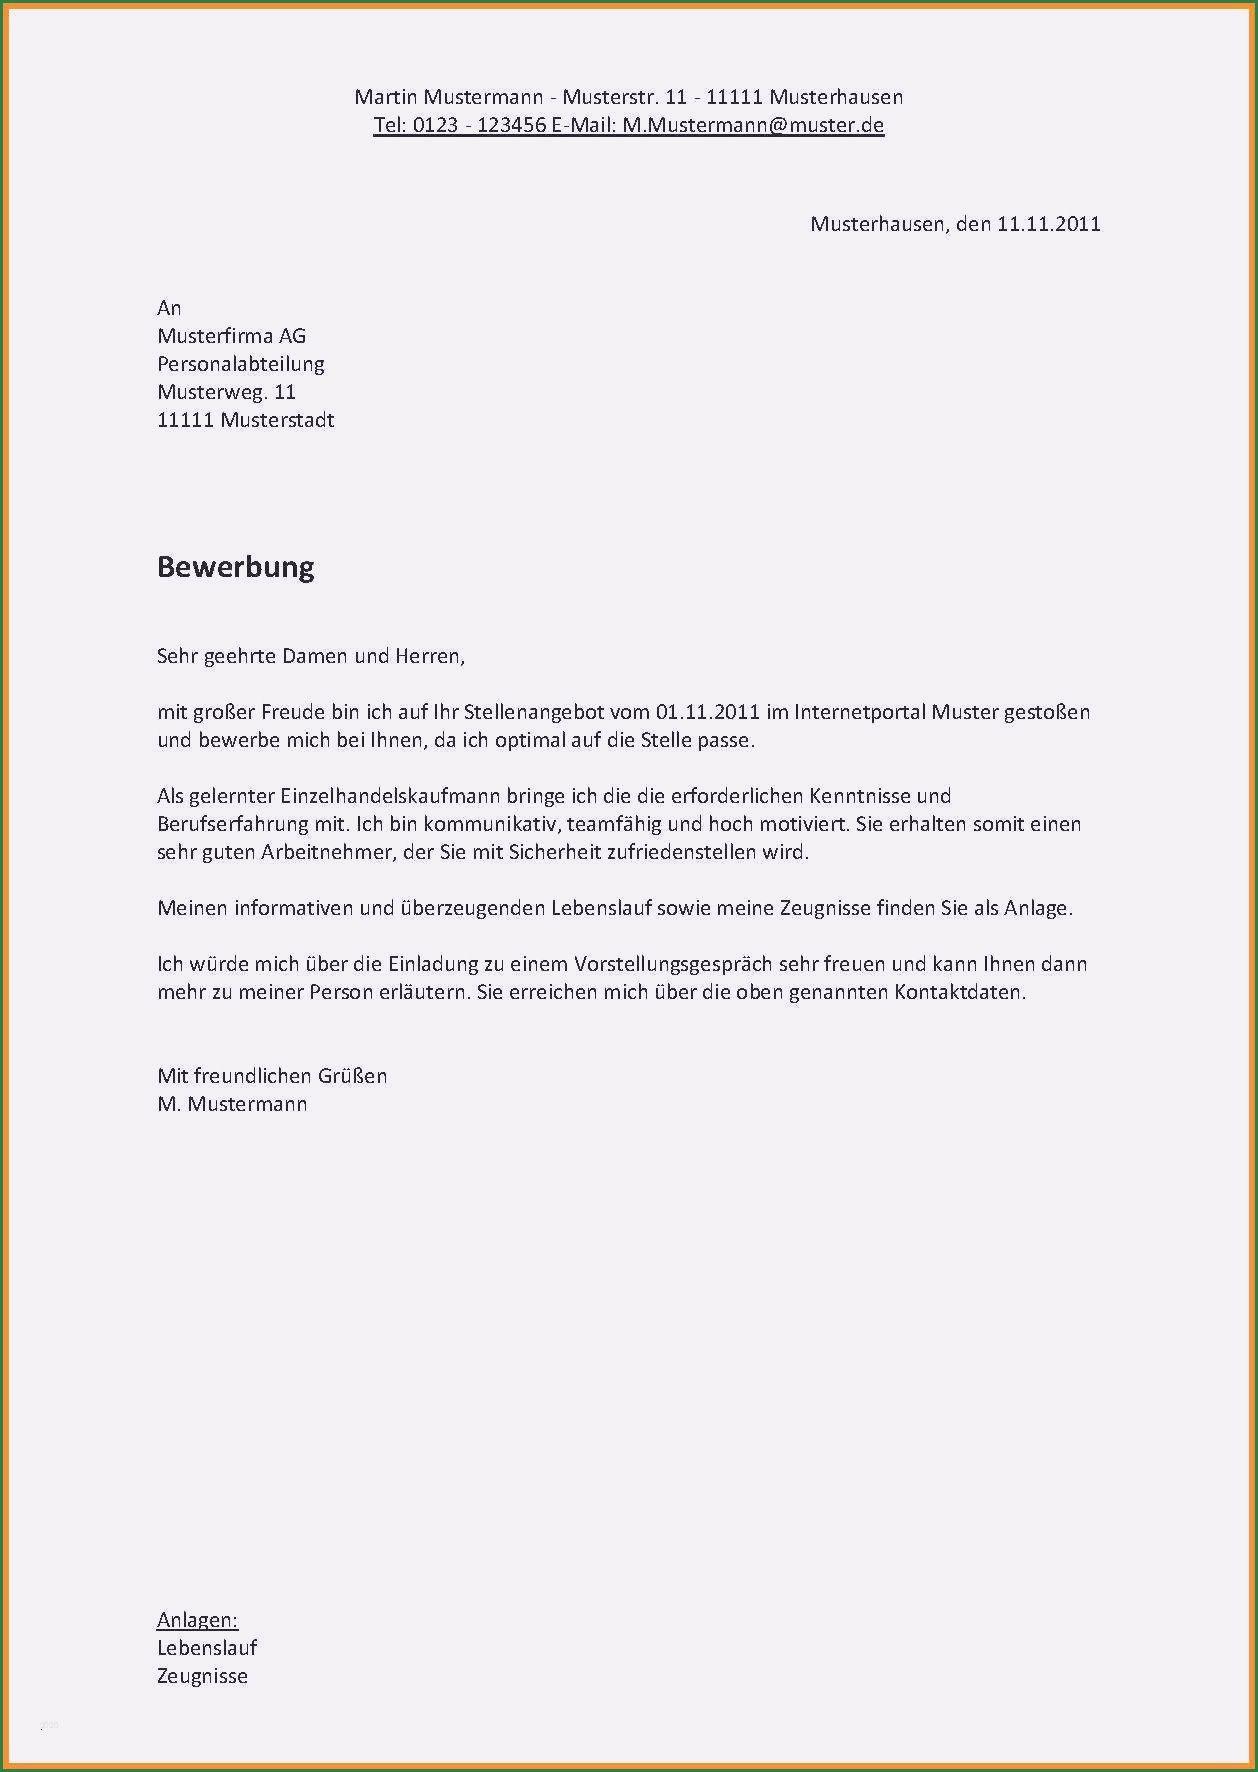 6 Angenehm Bewerbung Betriebselektriker Vorlage Bewerbung Schreiben Bewerbung Anschreiben Muster Bewerbungsschreiben